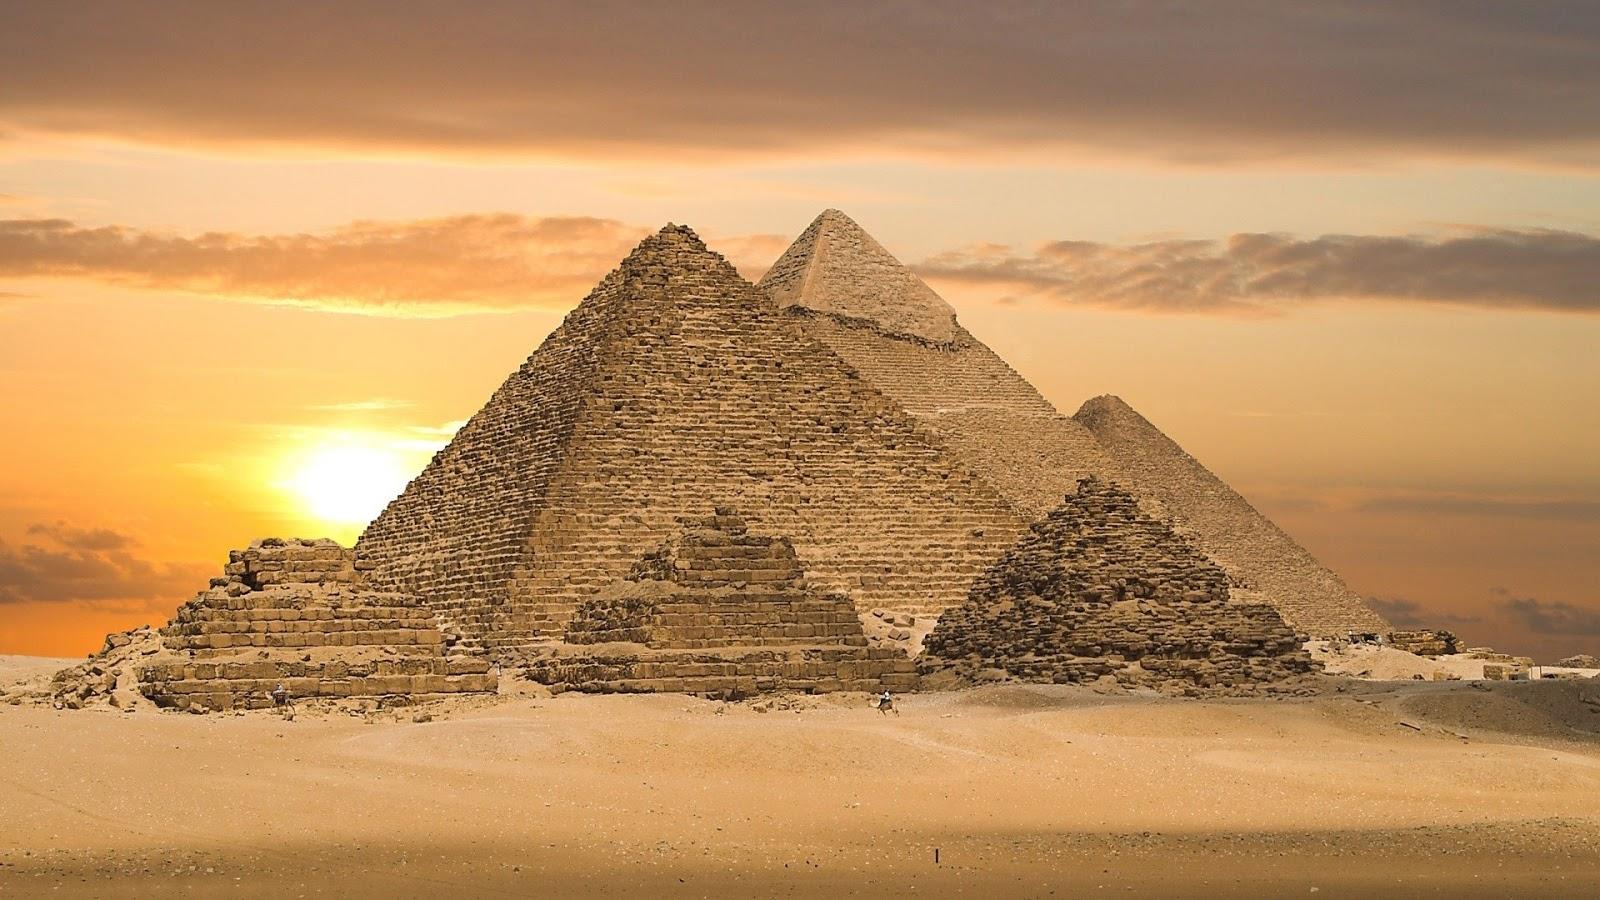 http://2.bp.blogspot.com/-SGHJ8soye2A/UOMiVcSXAXI/AAAAAAAASO4/-N1Ff54BUY8/s1600/piramides+(2).jpg